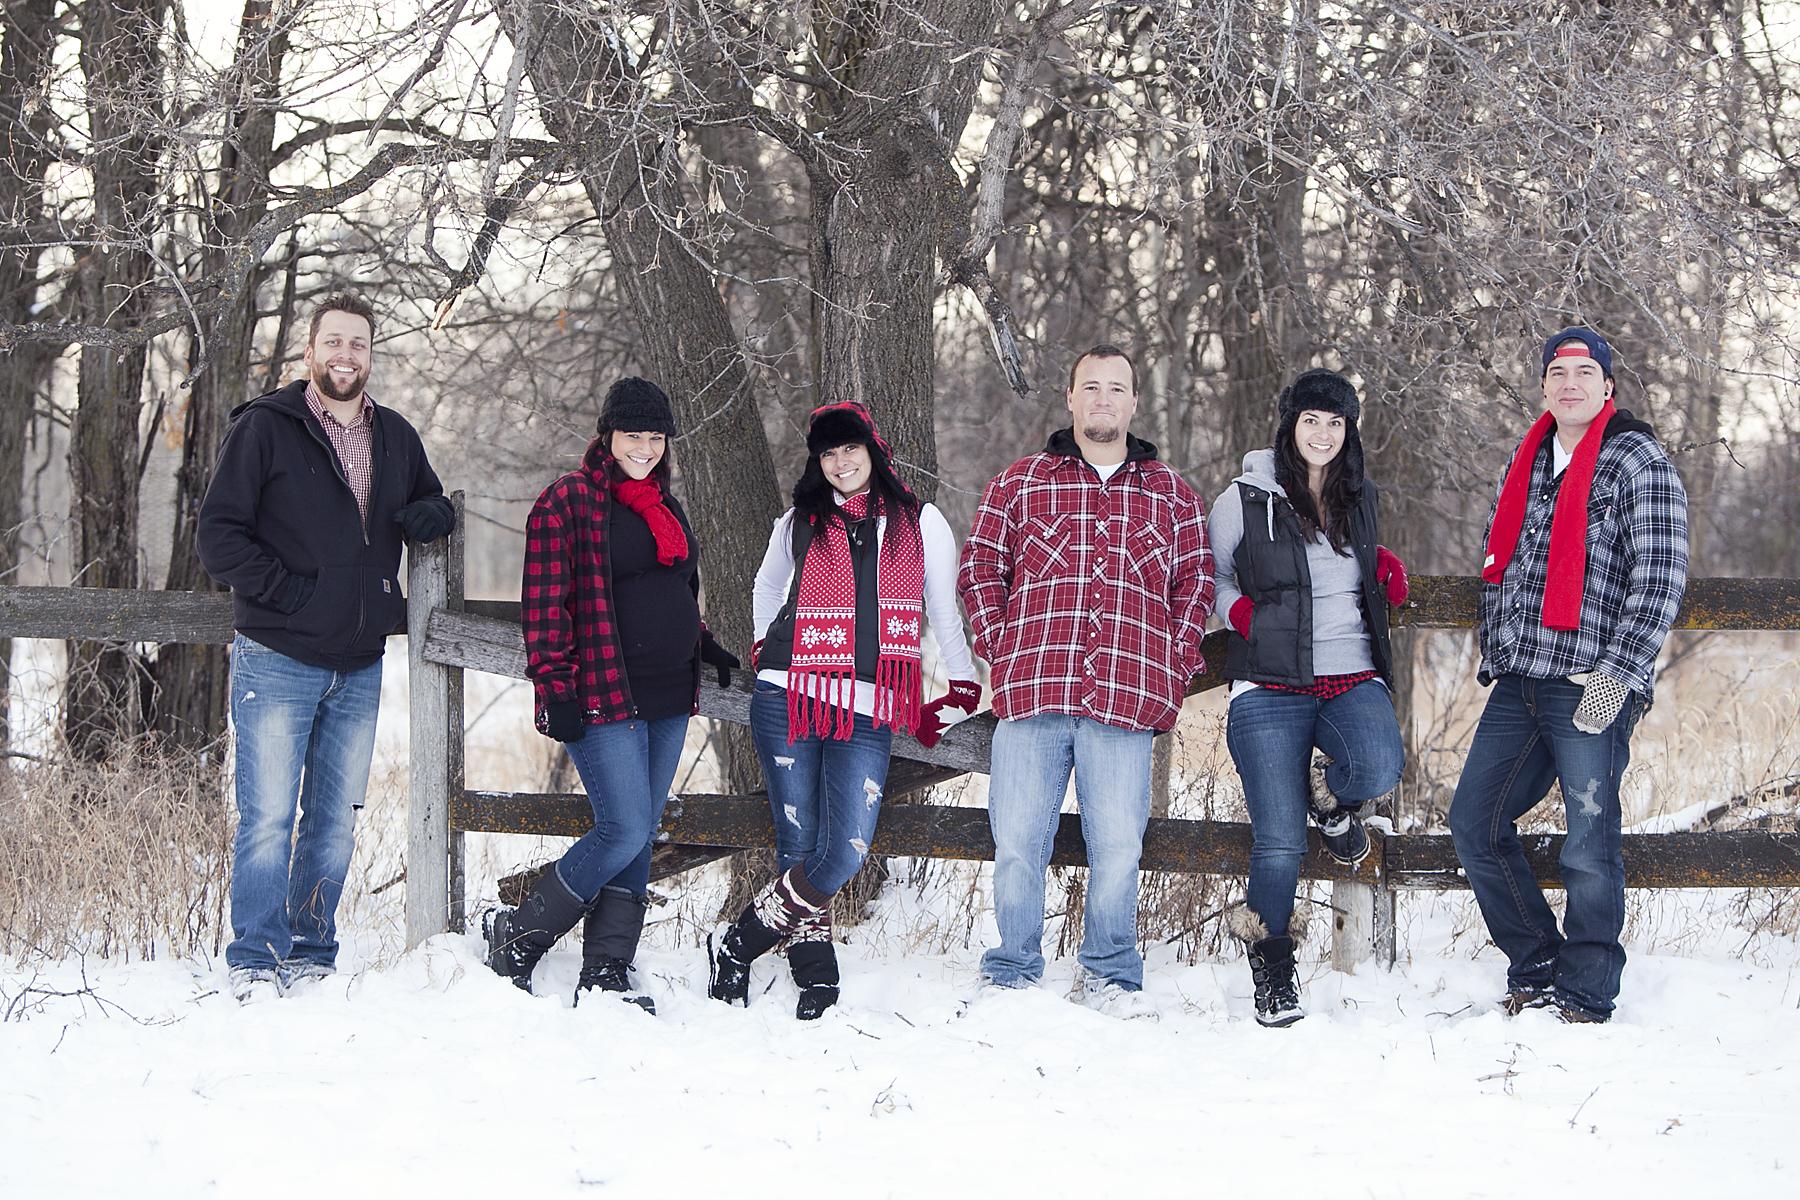 Winter Family Fun | Godfredsen Photography